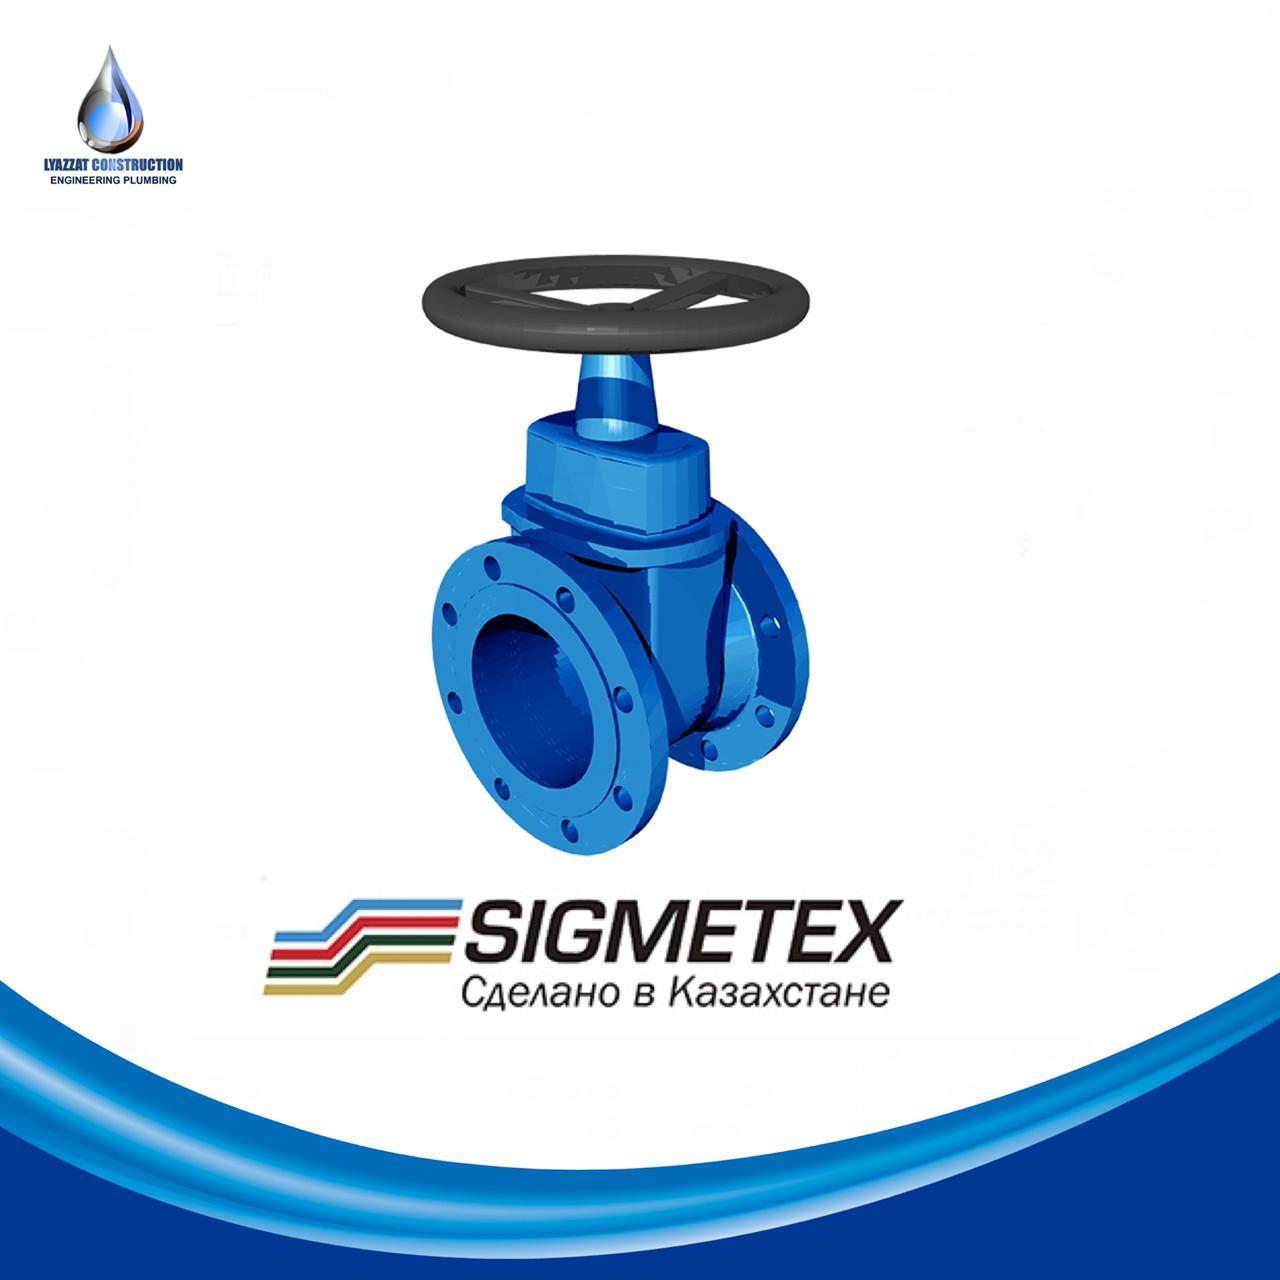 Задвижка Sigmetex DN 350 (Сигметэкс)